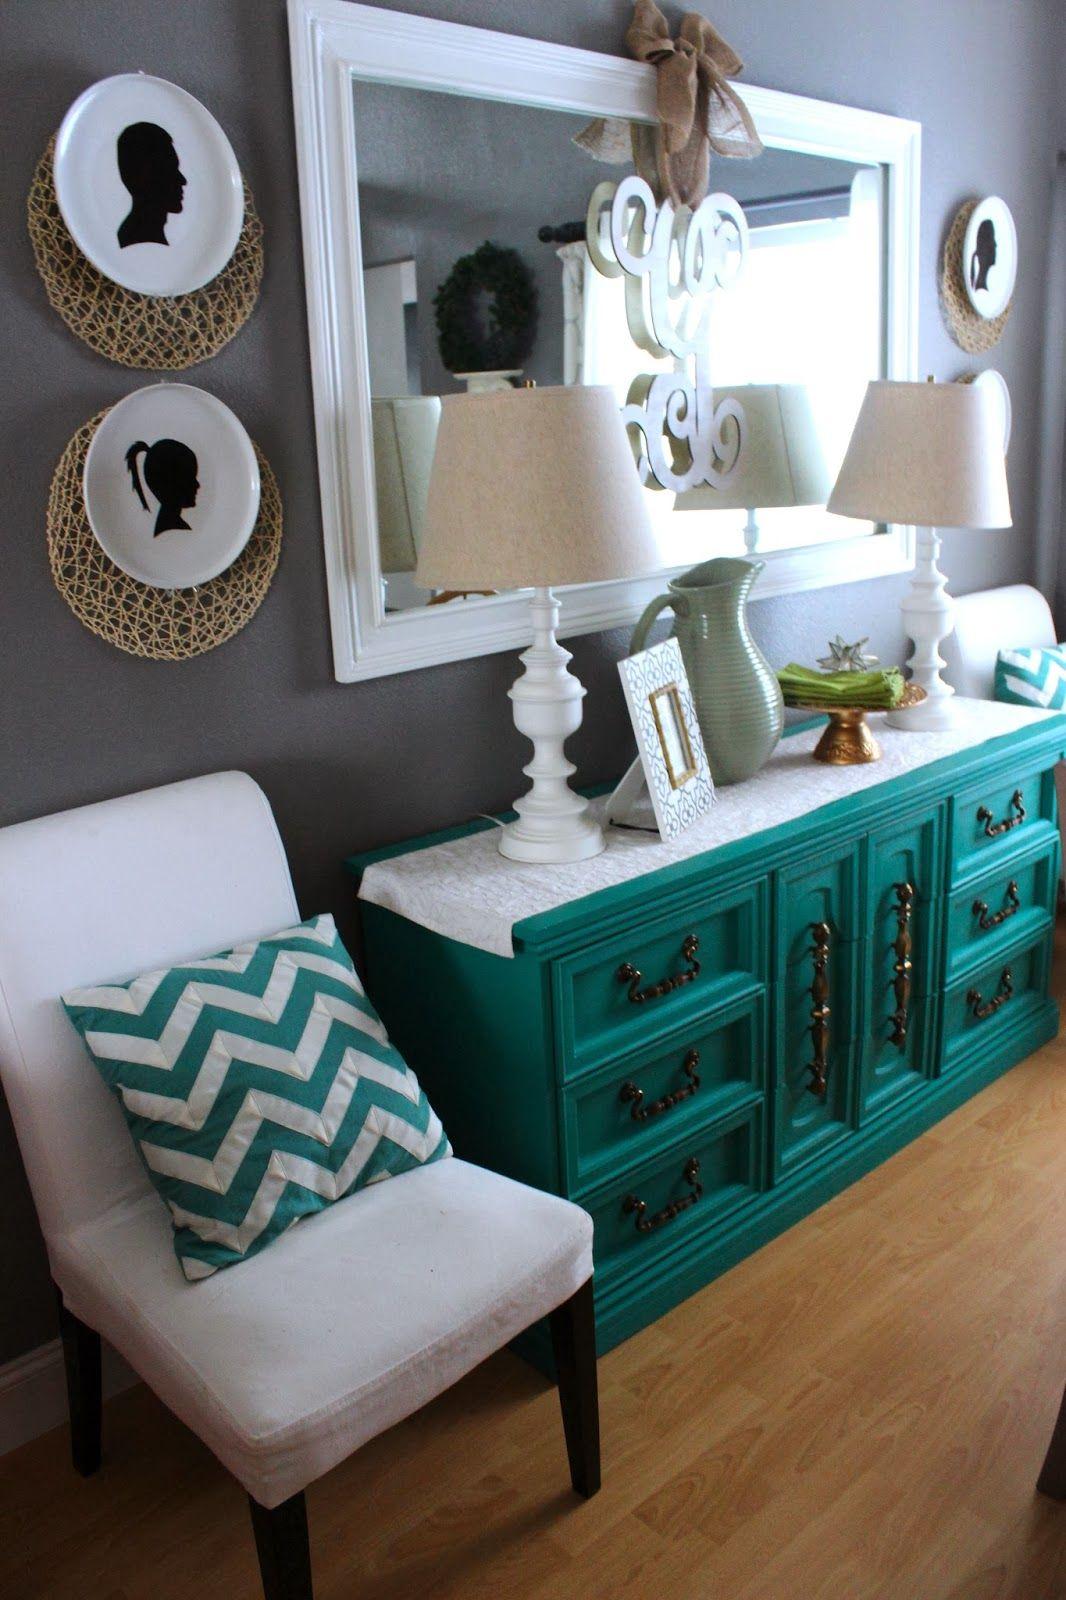 Craigslist Dresser Chalk Paint Cool DIY Idea Easy Project Best Tutorial Crafts And